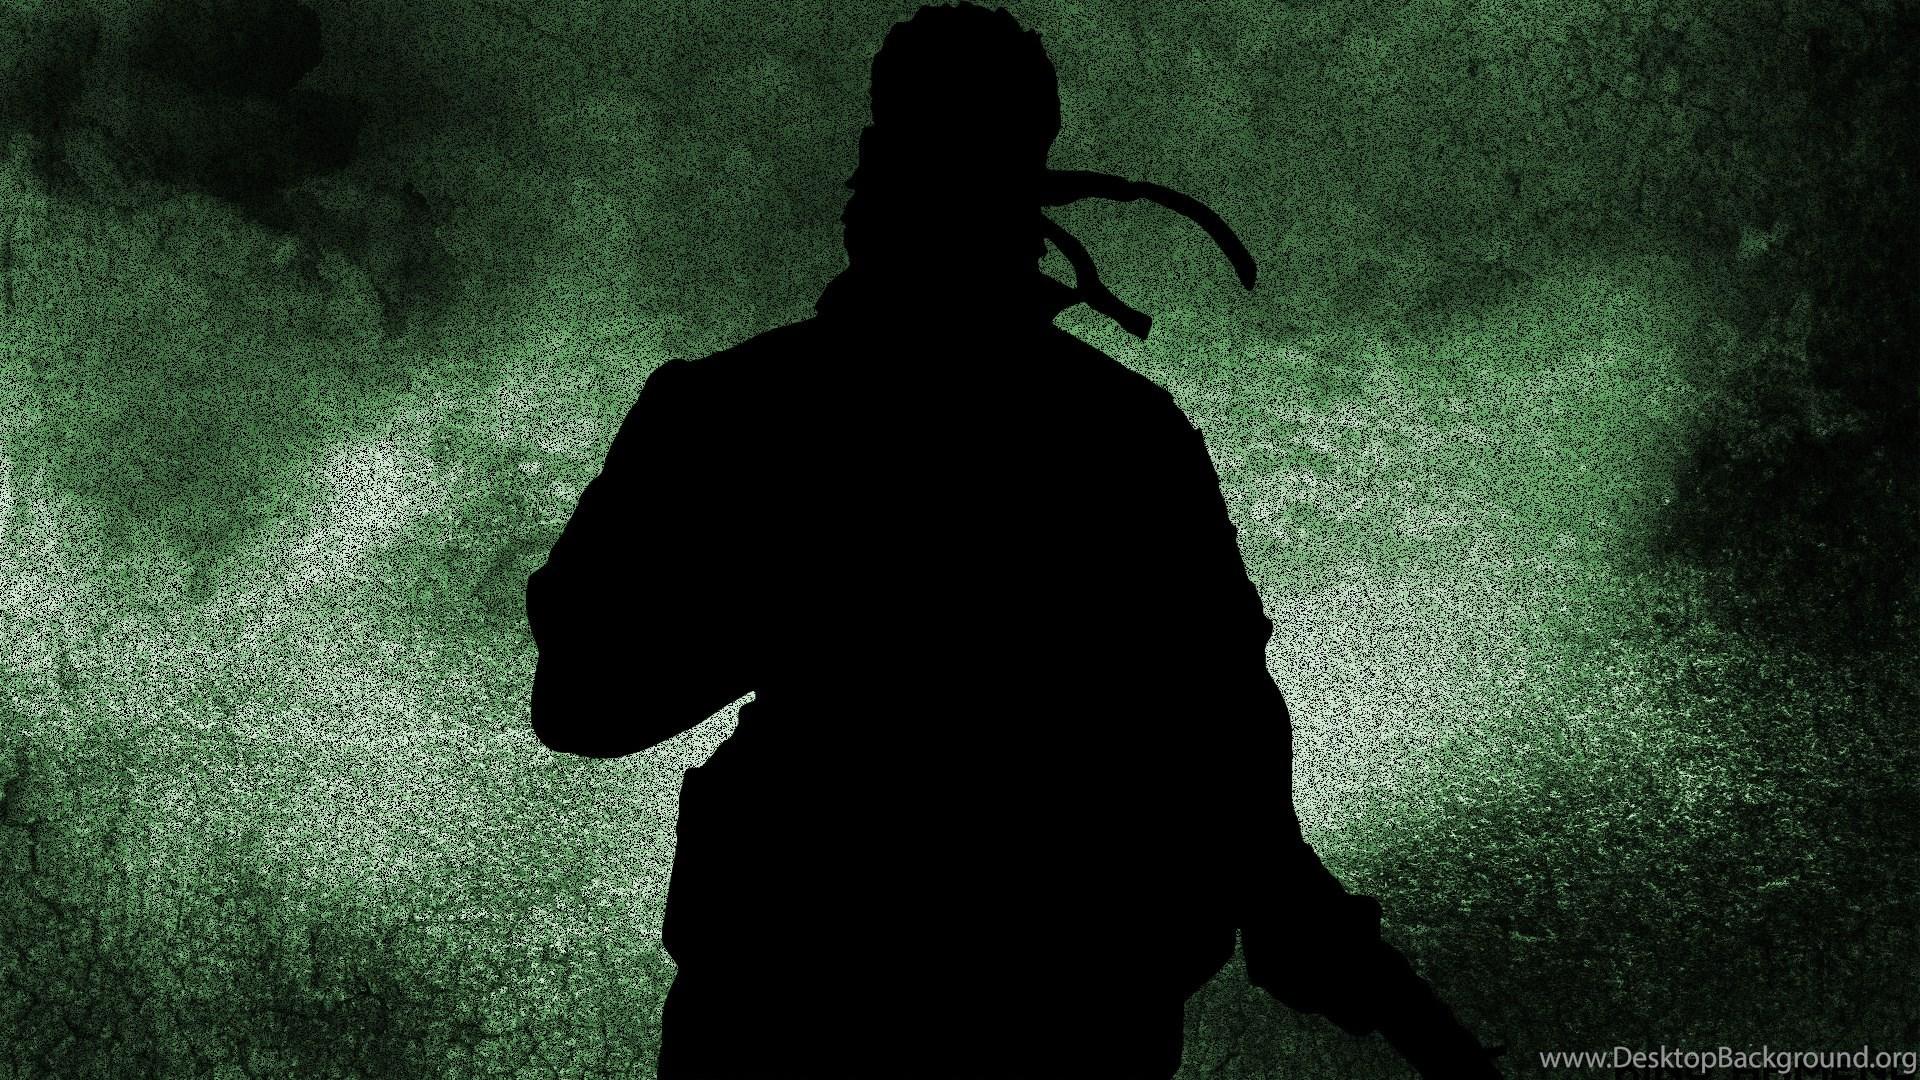 Metal Gear Solid Big Boss Wallpaper Itunes By Kingarmend On